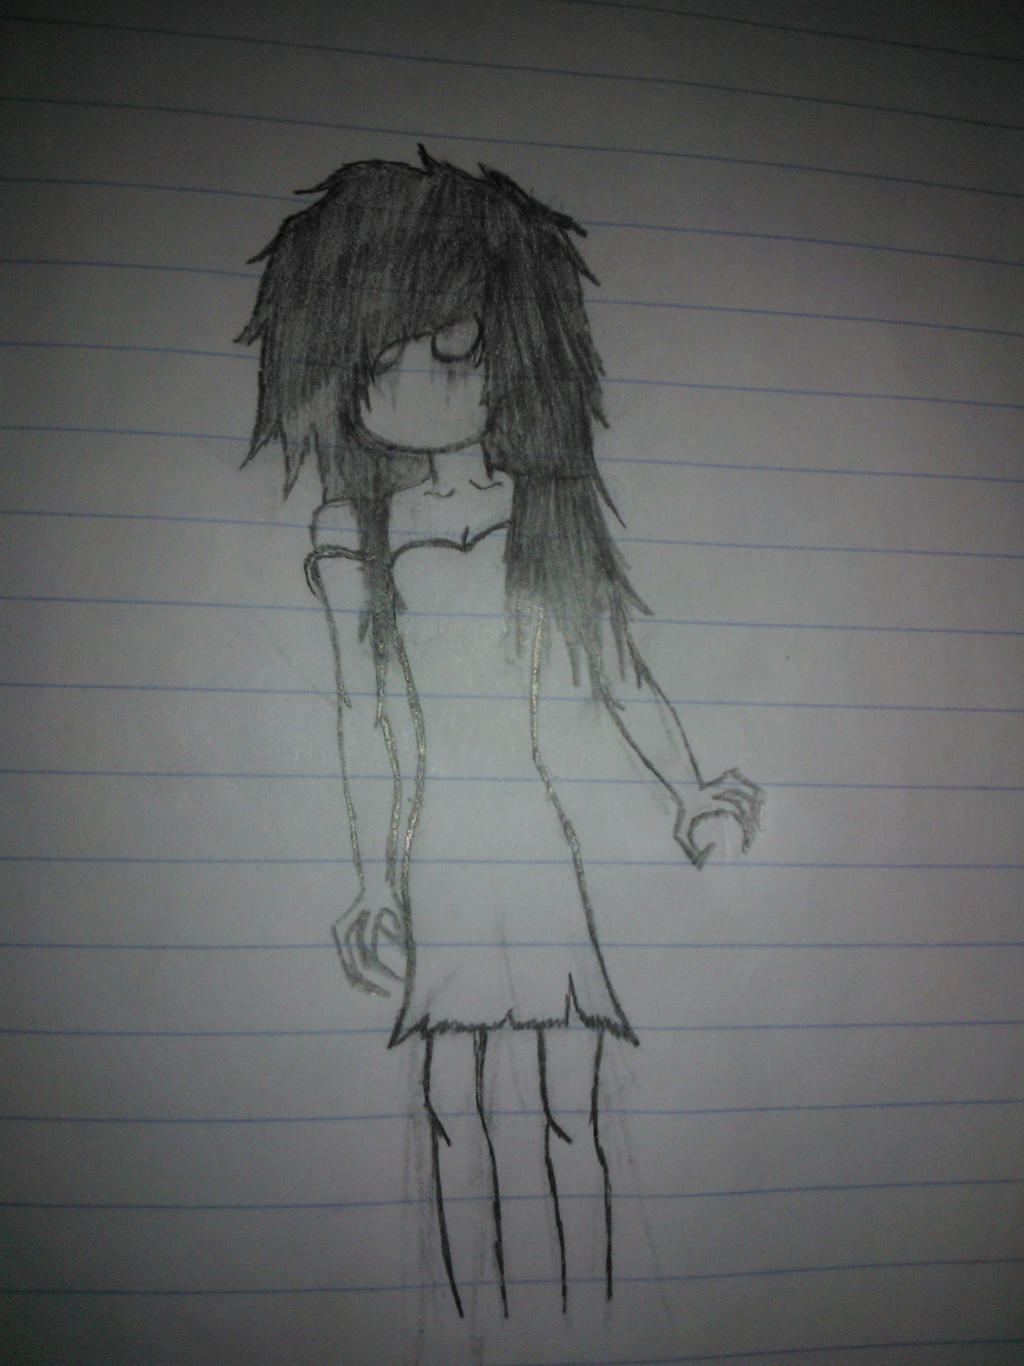 Creepy girl by Boojaybabe